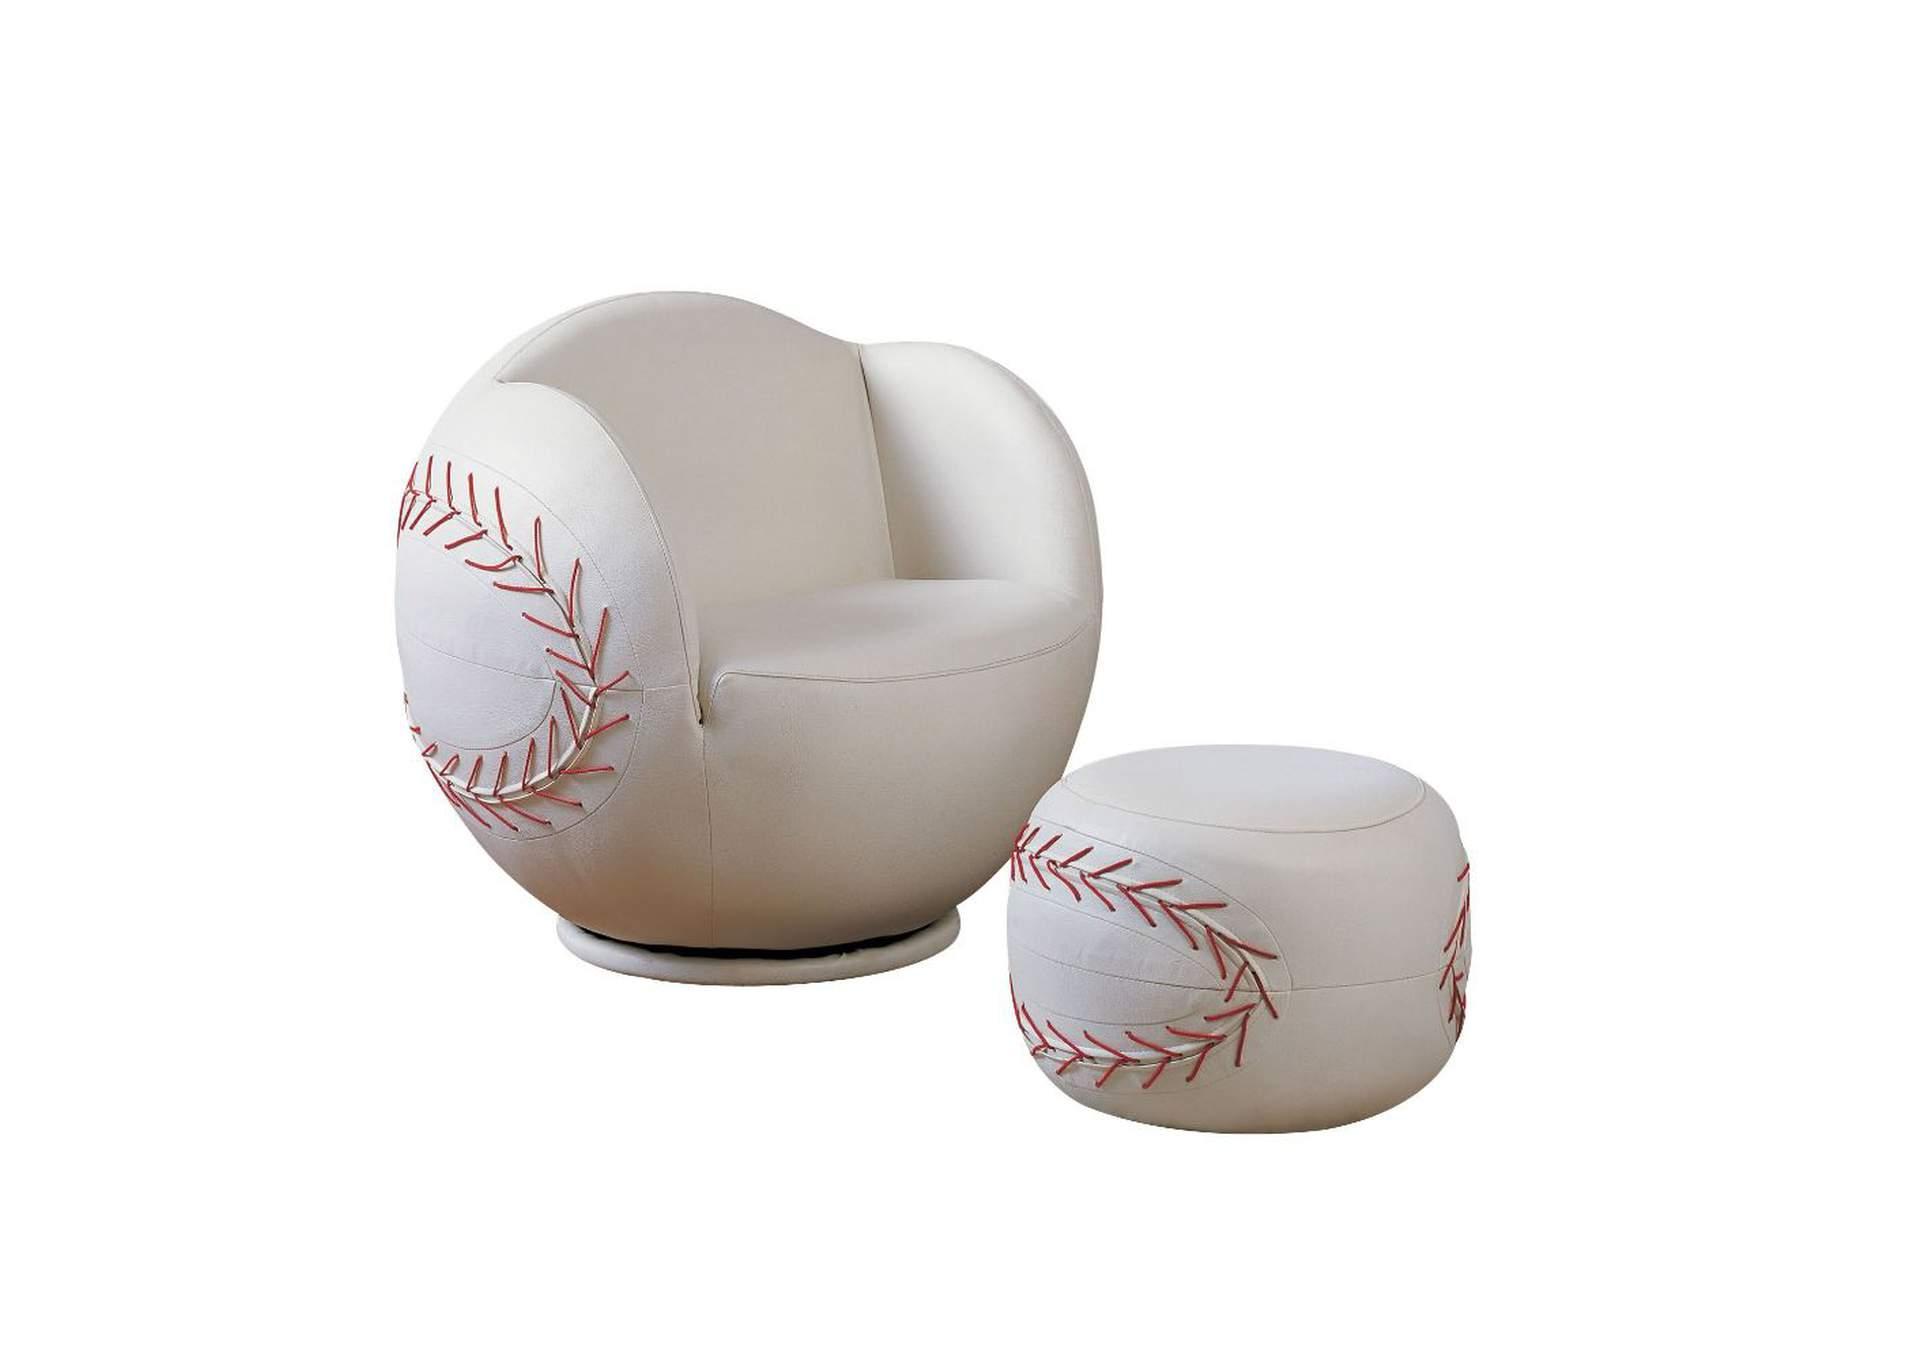 Baseball Chair Best Things to Buy